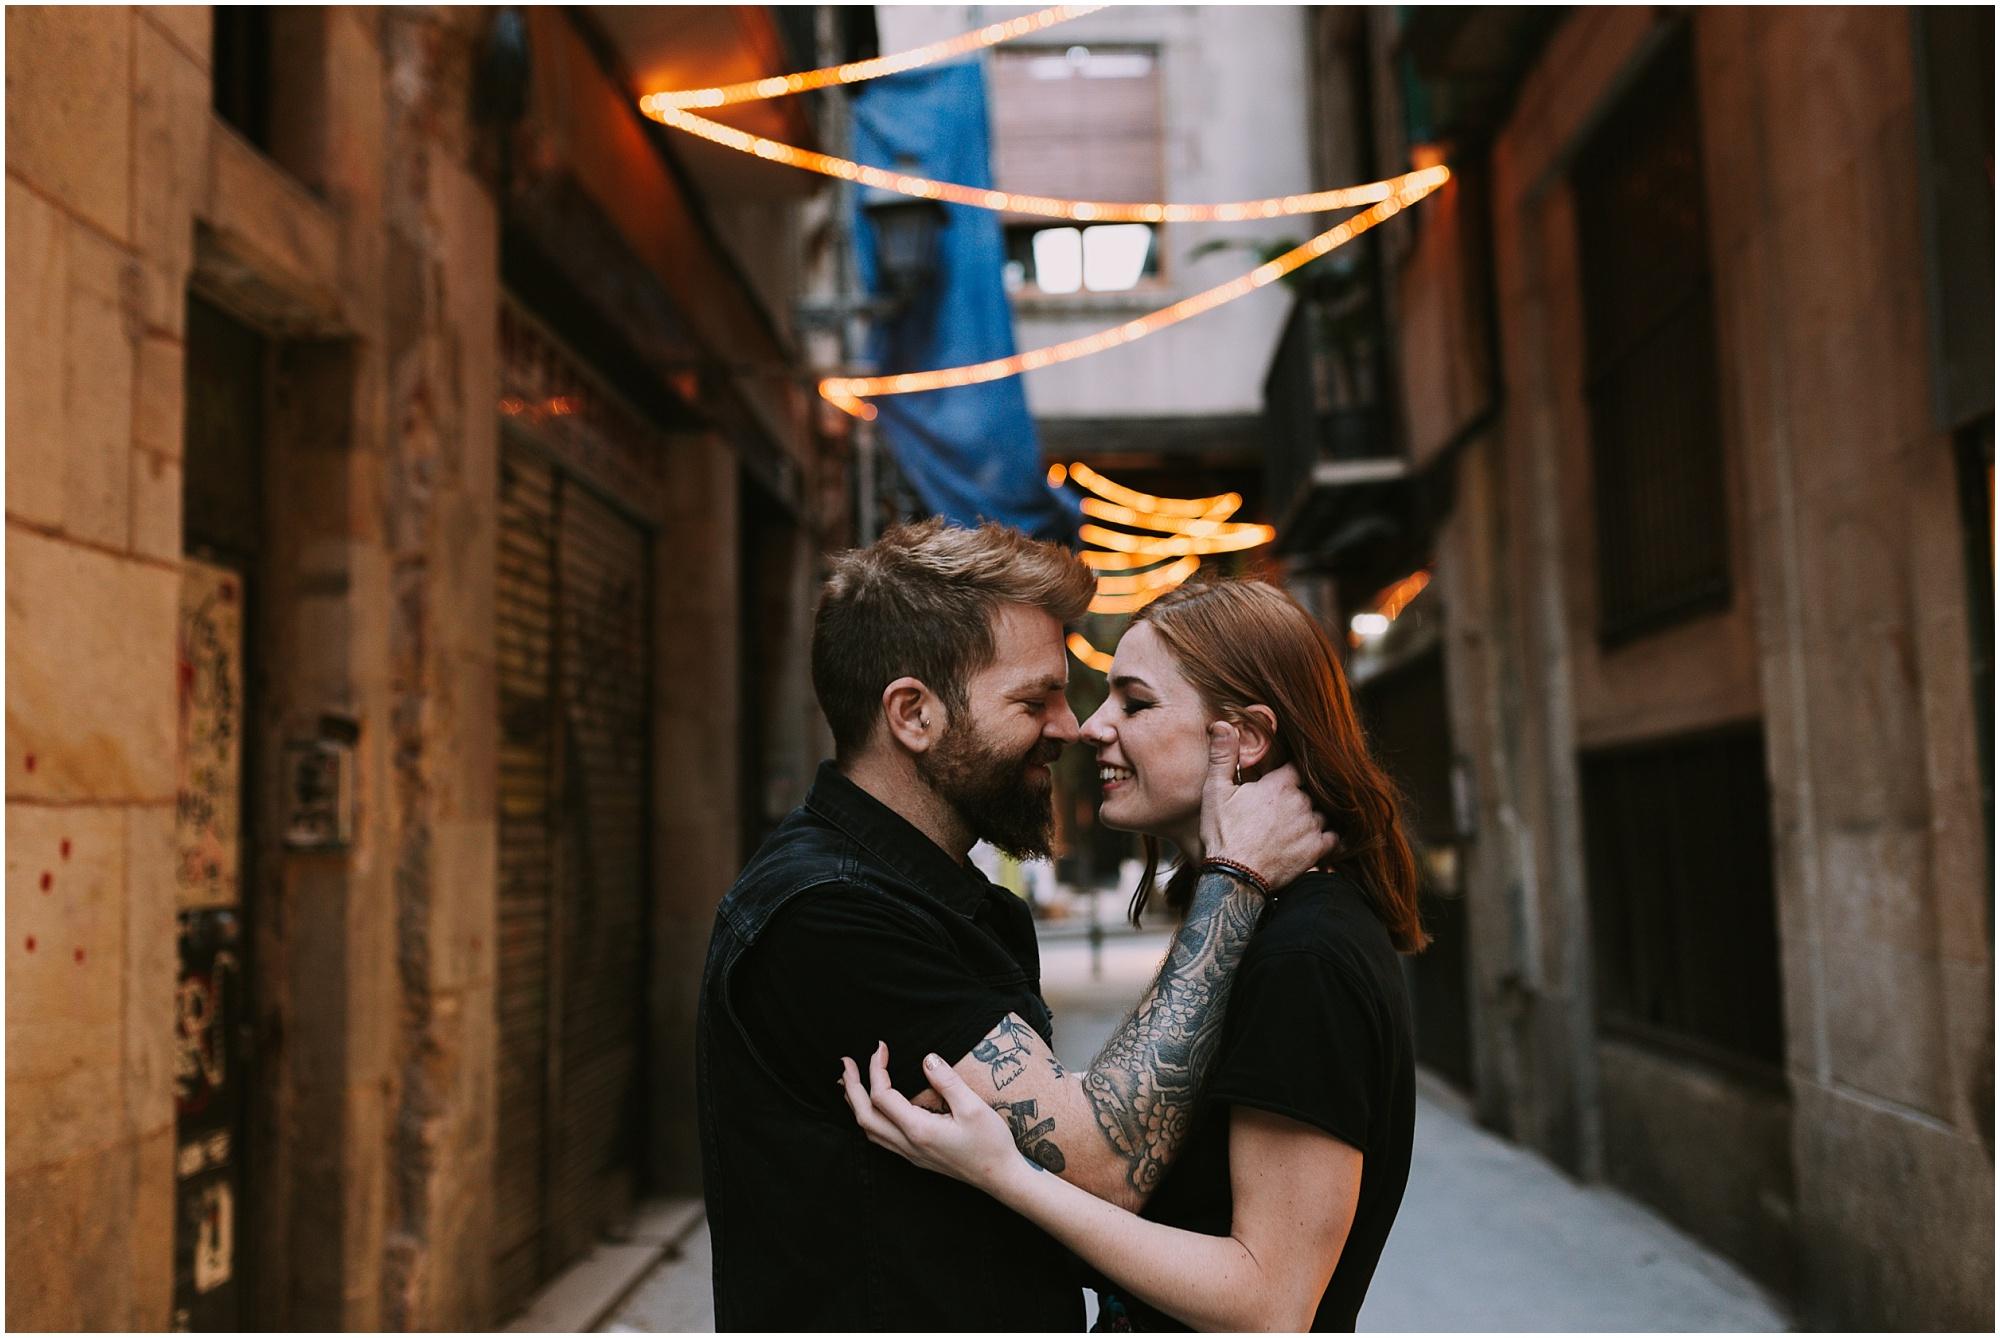 Kateryna-photos-photographer-mariage-boda-love-story-engagement-barcelona_0015.jpg